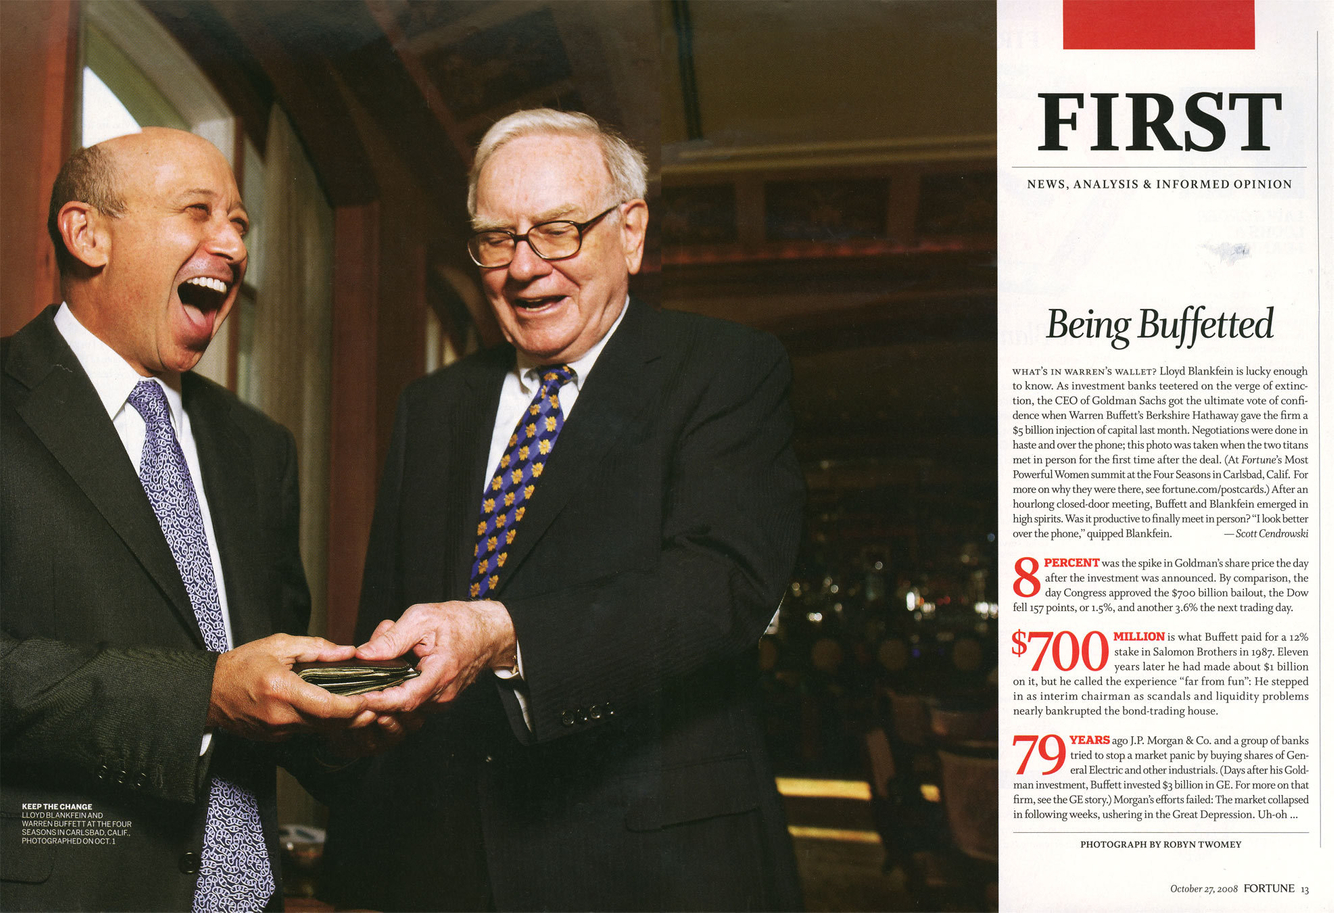 Lloyd Blankfein and Warren Buffett, Dana Point, CA